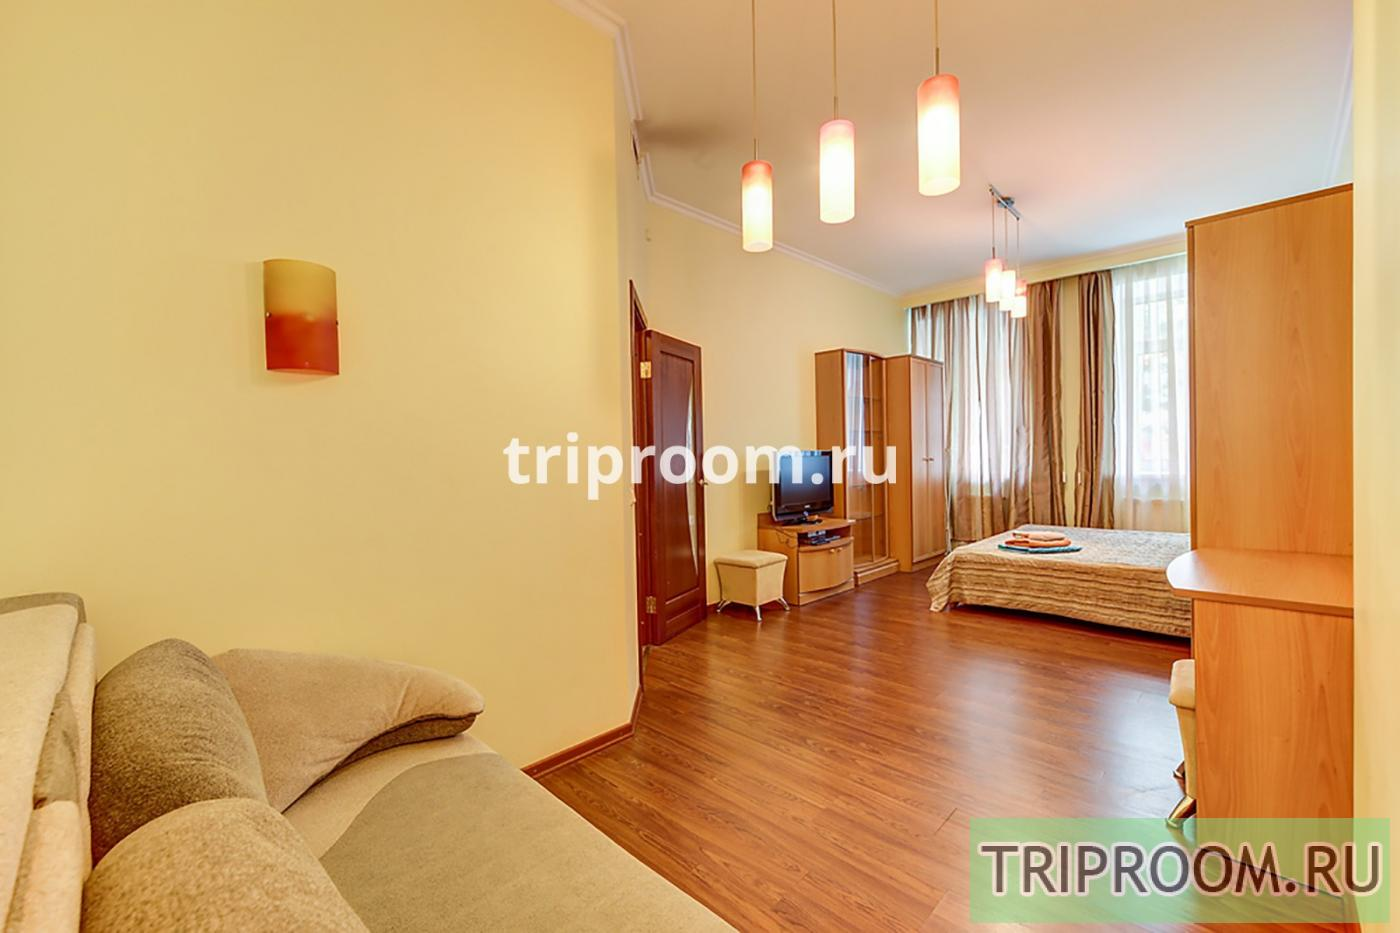 1-комнатная квартира посуточно (вариант № 15527), ул. Канала Грибоедова набережная, фото № 11